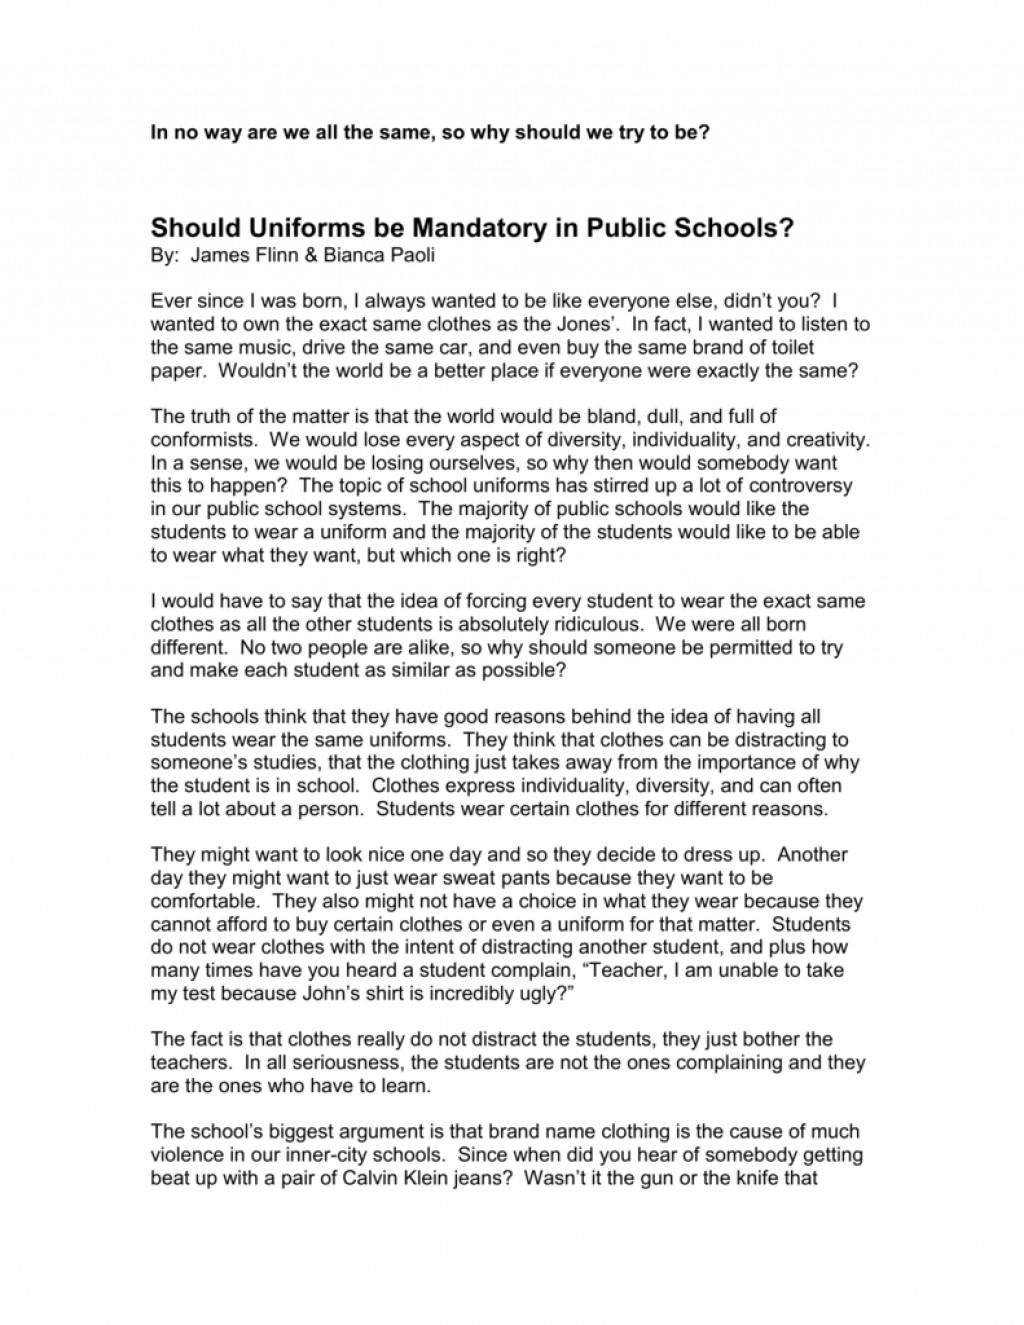 005 Should Students Wear School Uniforms Essay Example Uniform Essays Pros And Cons Poemsrom Co 008022782 1 Conclusion Not Impressive Ielts Sample Large